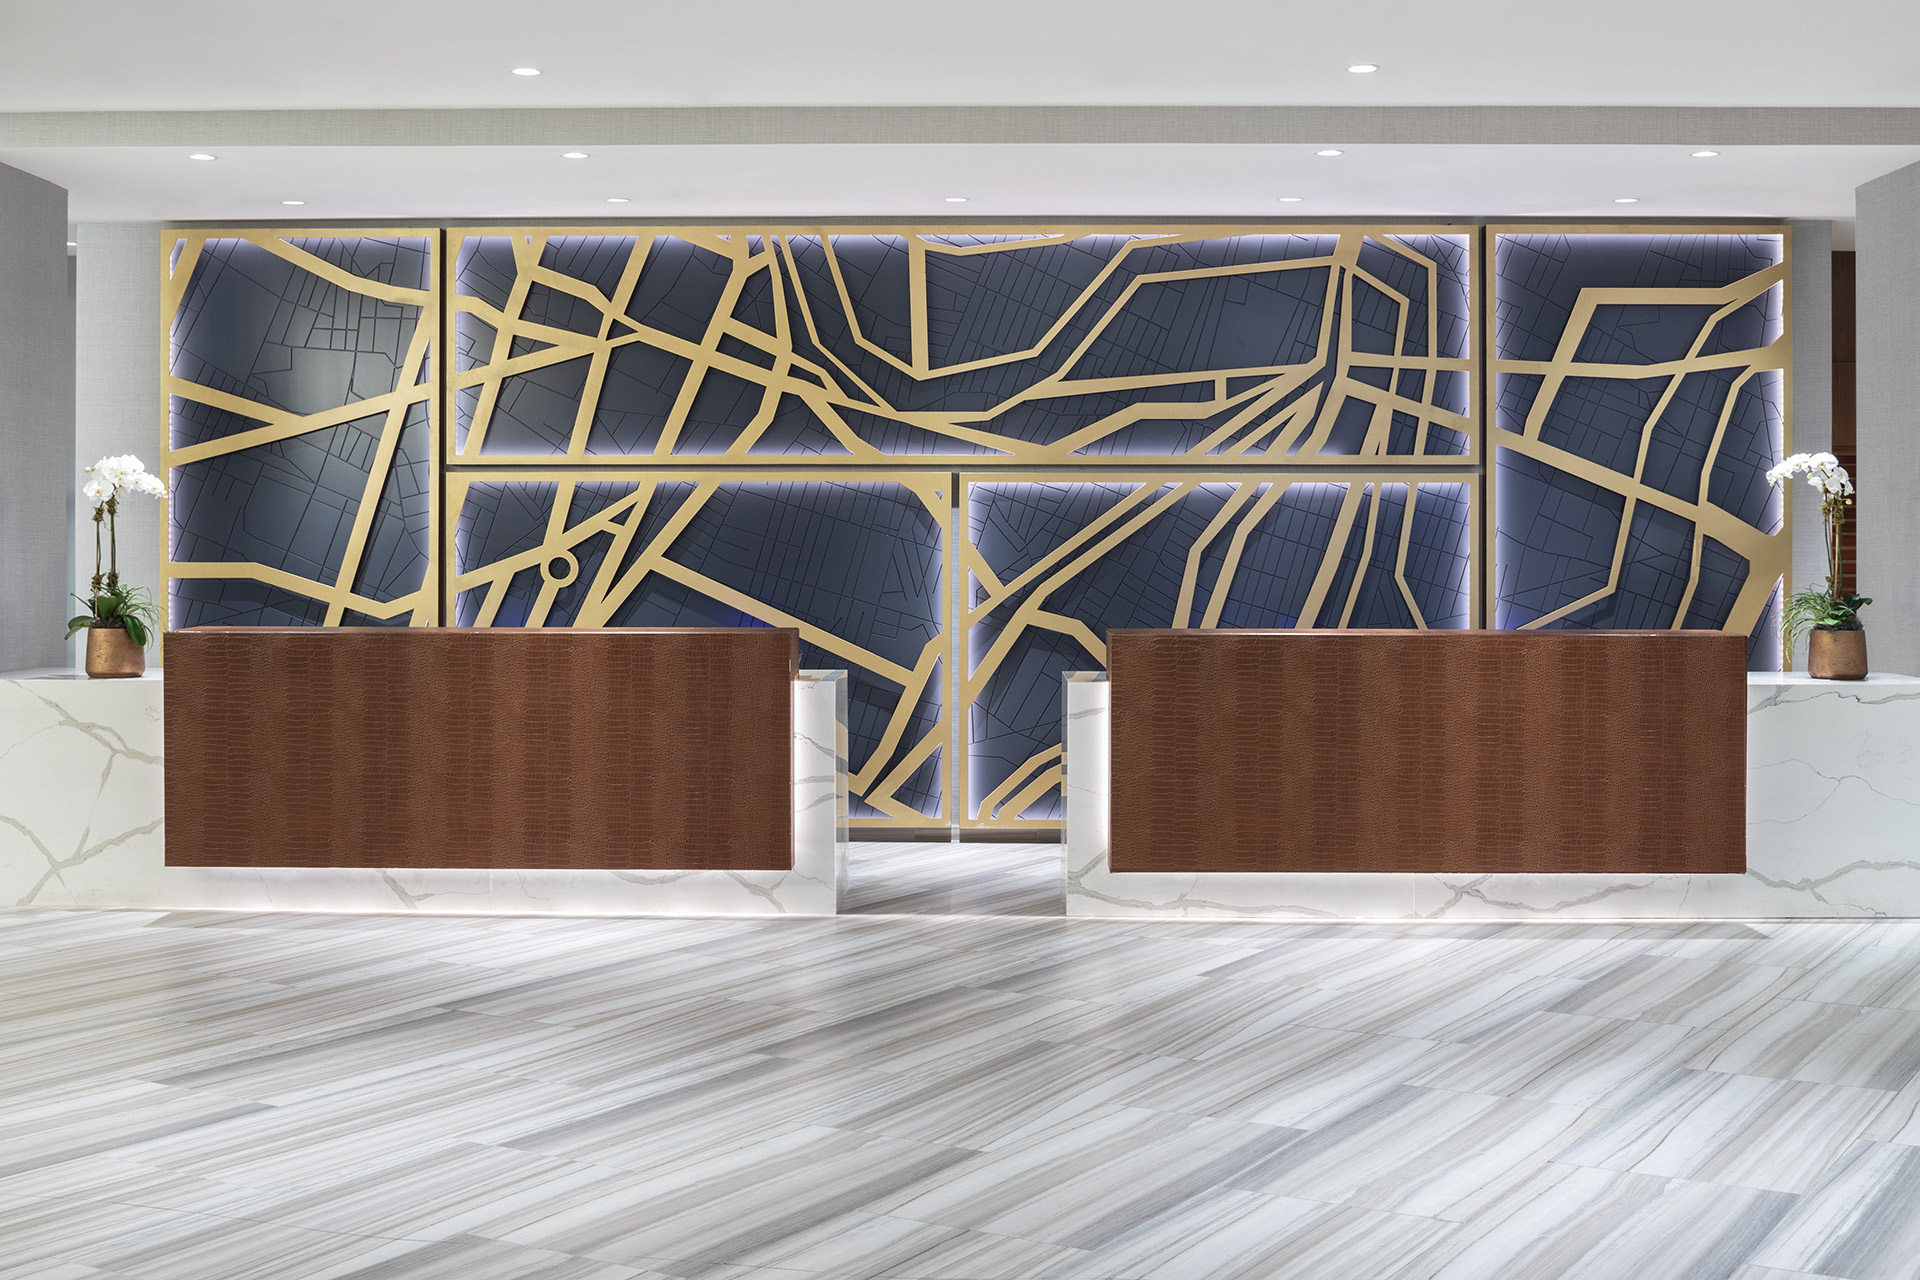 Hilton DoubleTree by Hilton Newark Airport